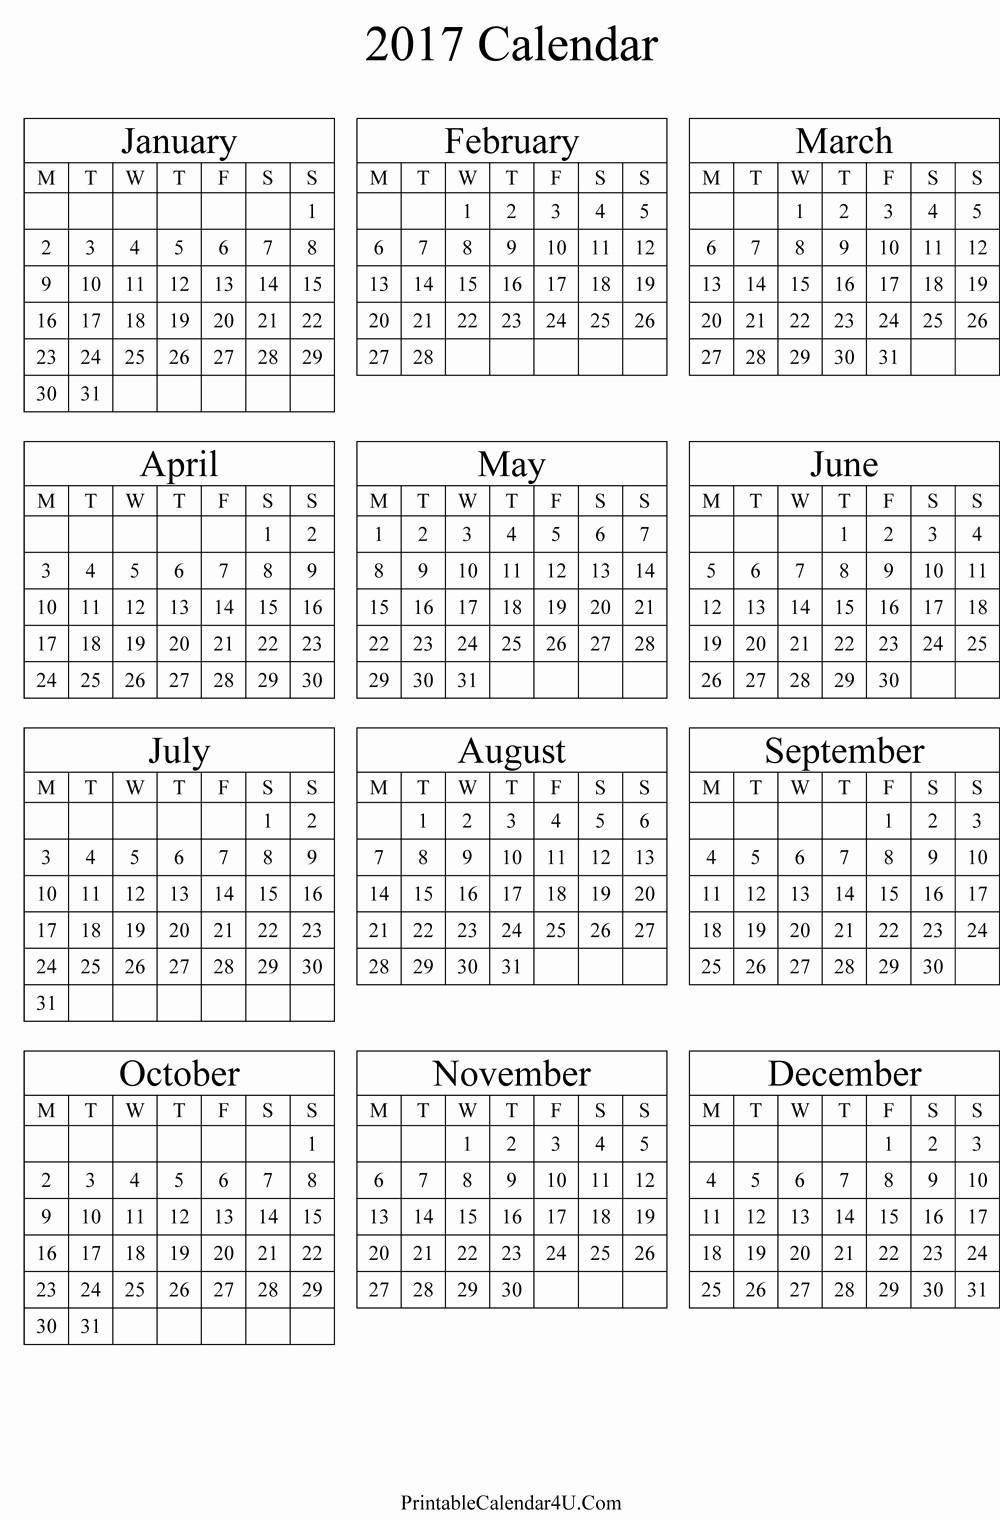 Printable 4 Month Calendar 2017 Best Of Annual Calendar 2017 Portrait Printable Calendar 2019 2020